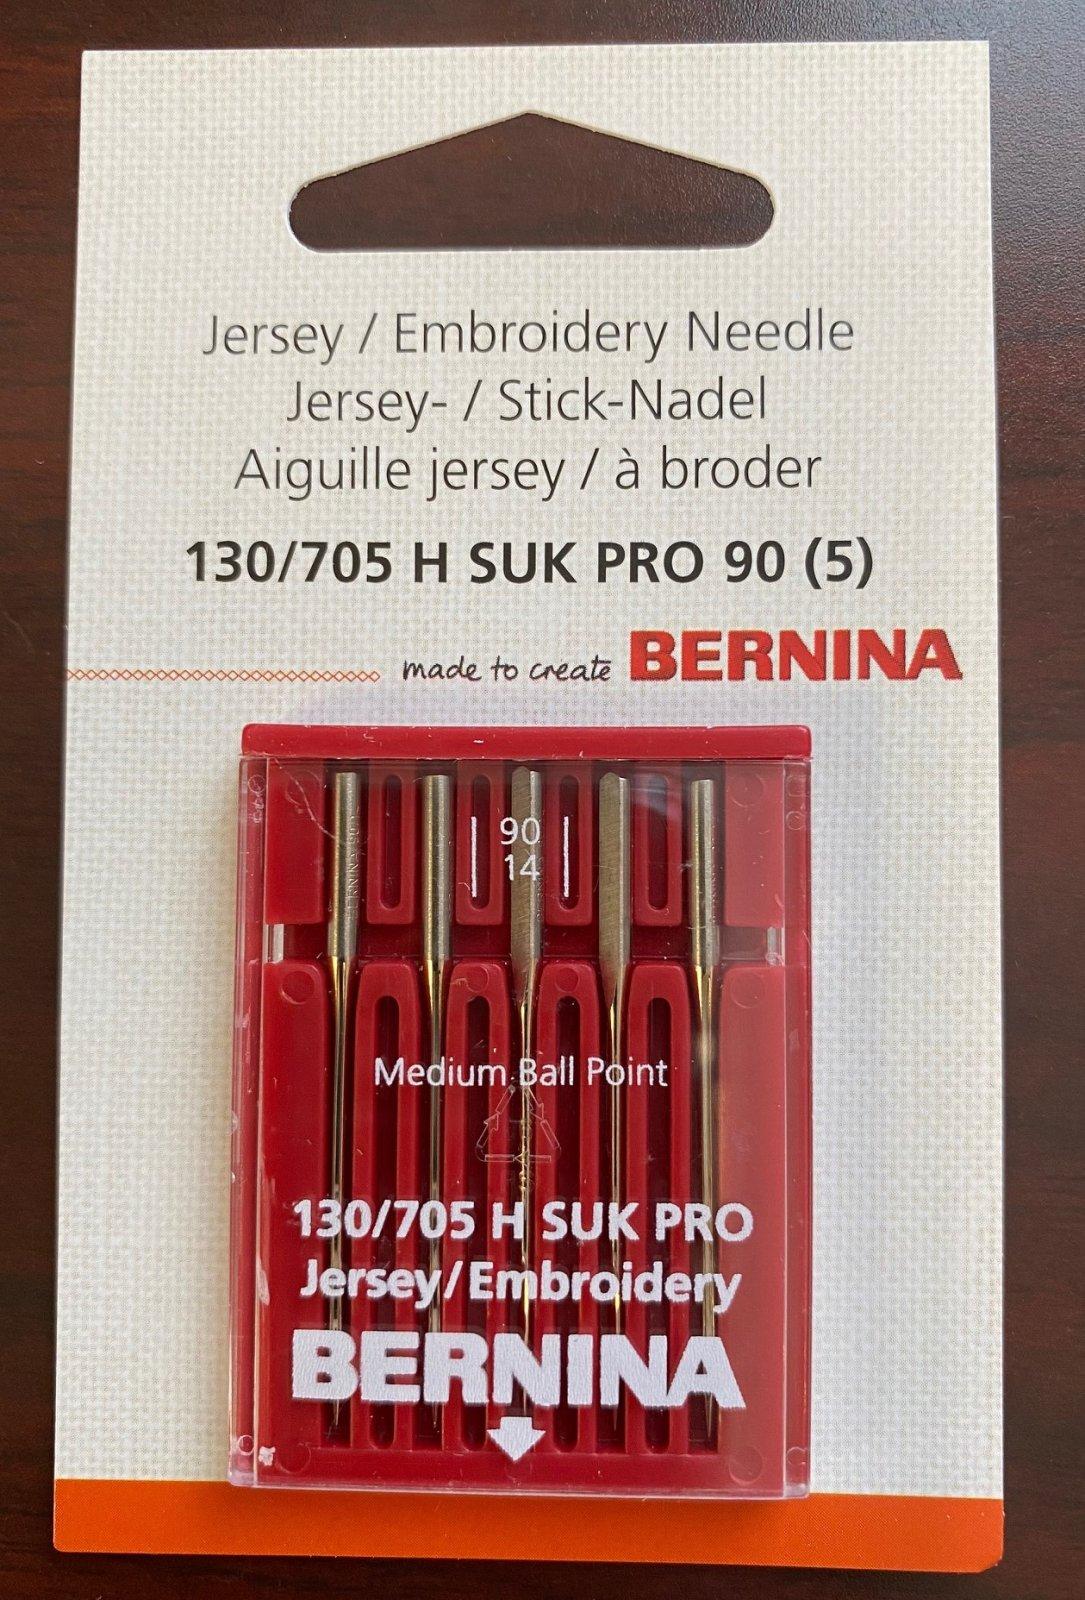 Bernina Needle 130/705 H SUK PRO 90 (5)